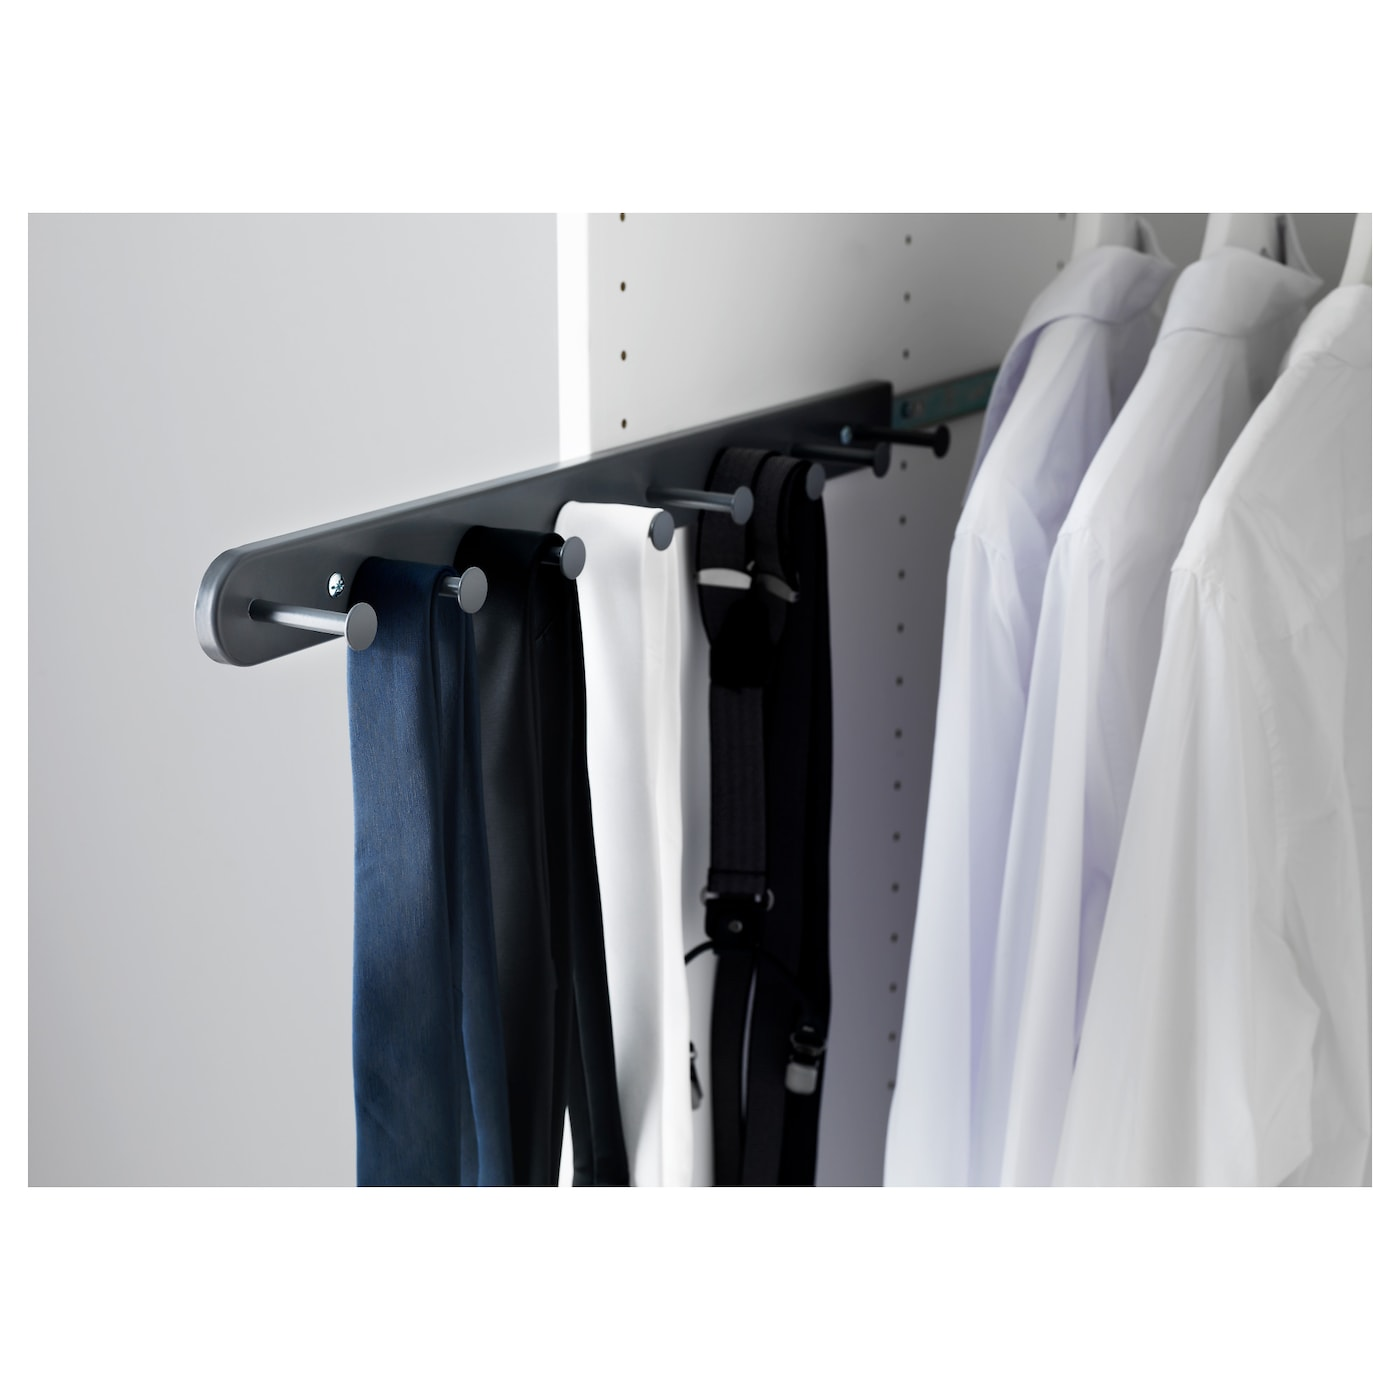 KOMPLEMENT Pull-out multi-use hanger, dark grey, 58 cm